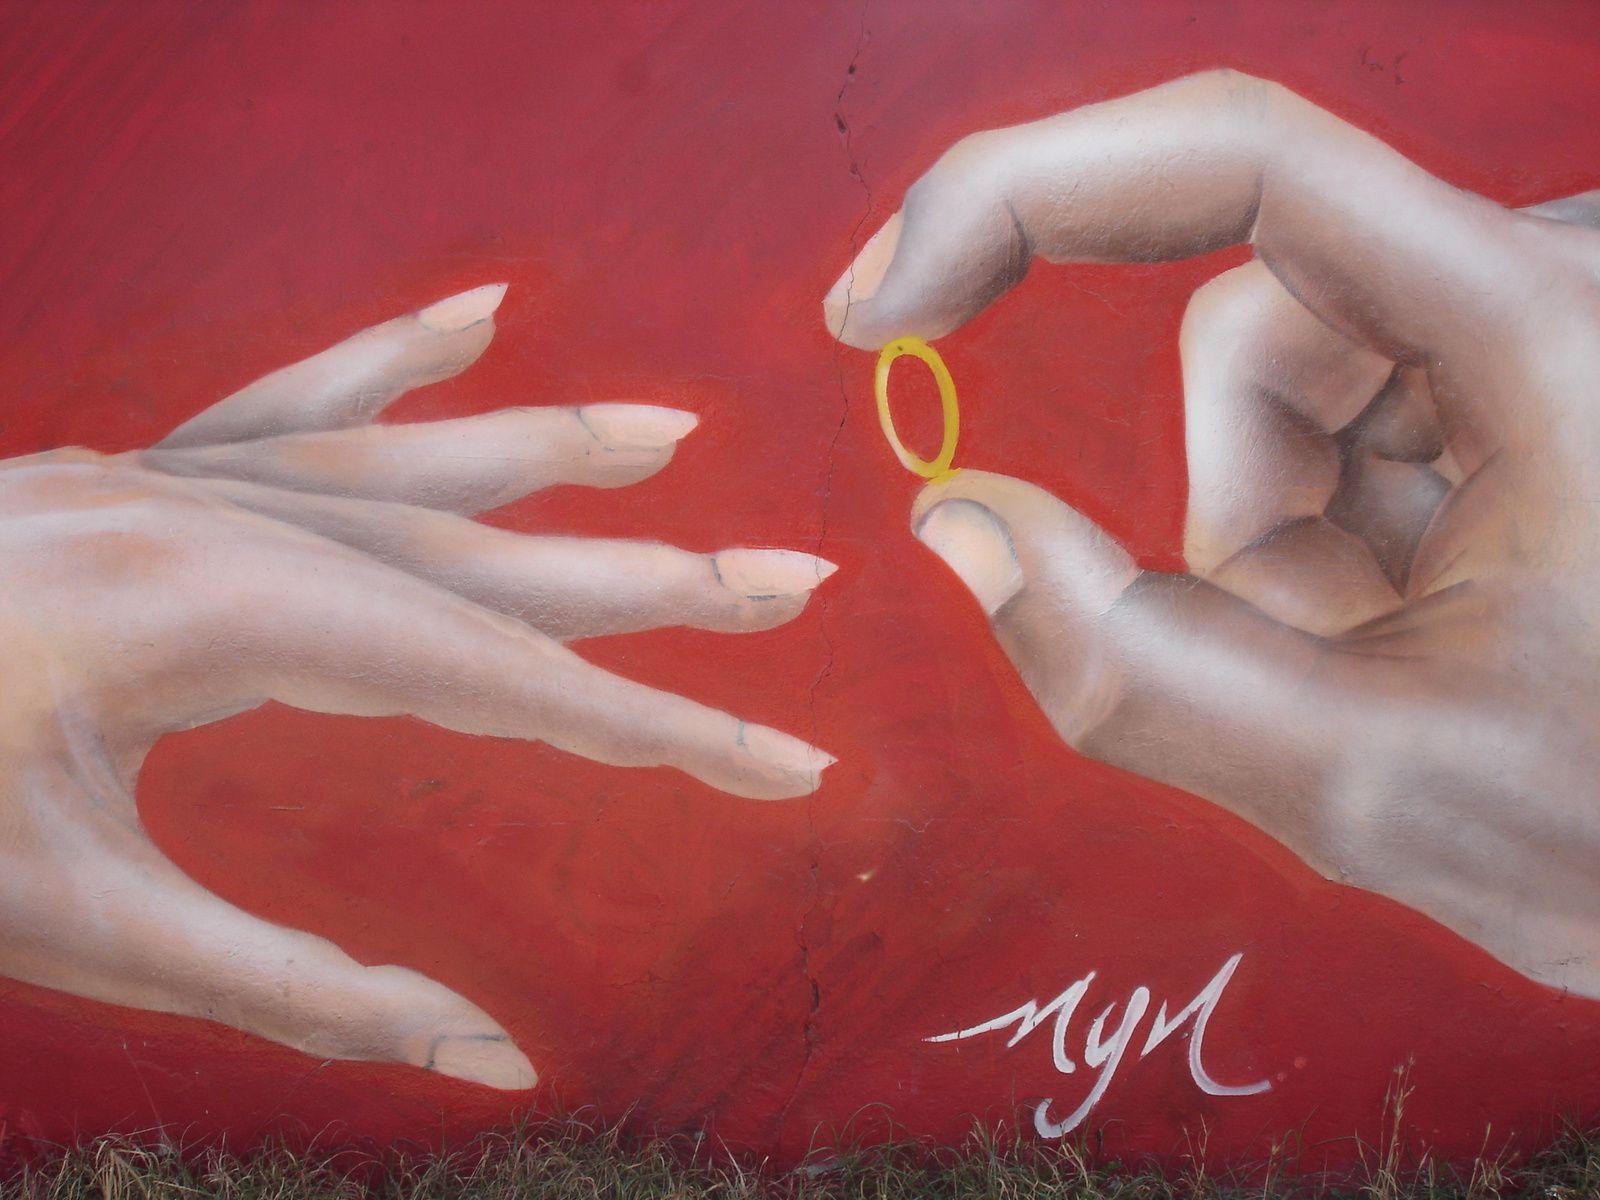 Ceci est une peinure murale de Valparaiso.